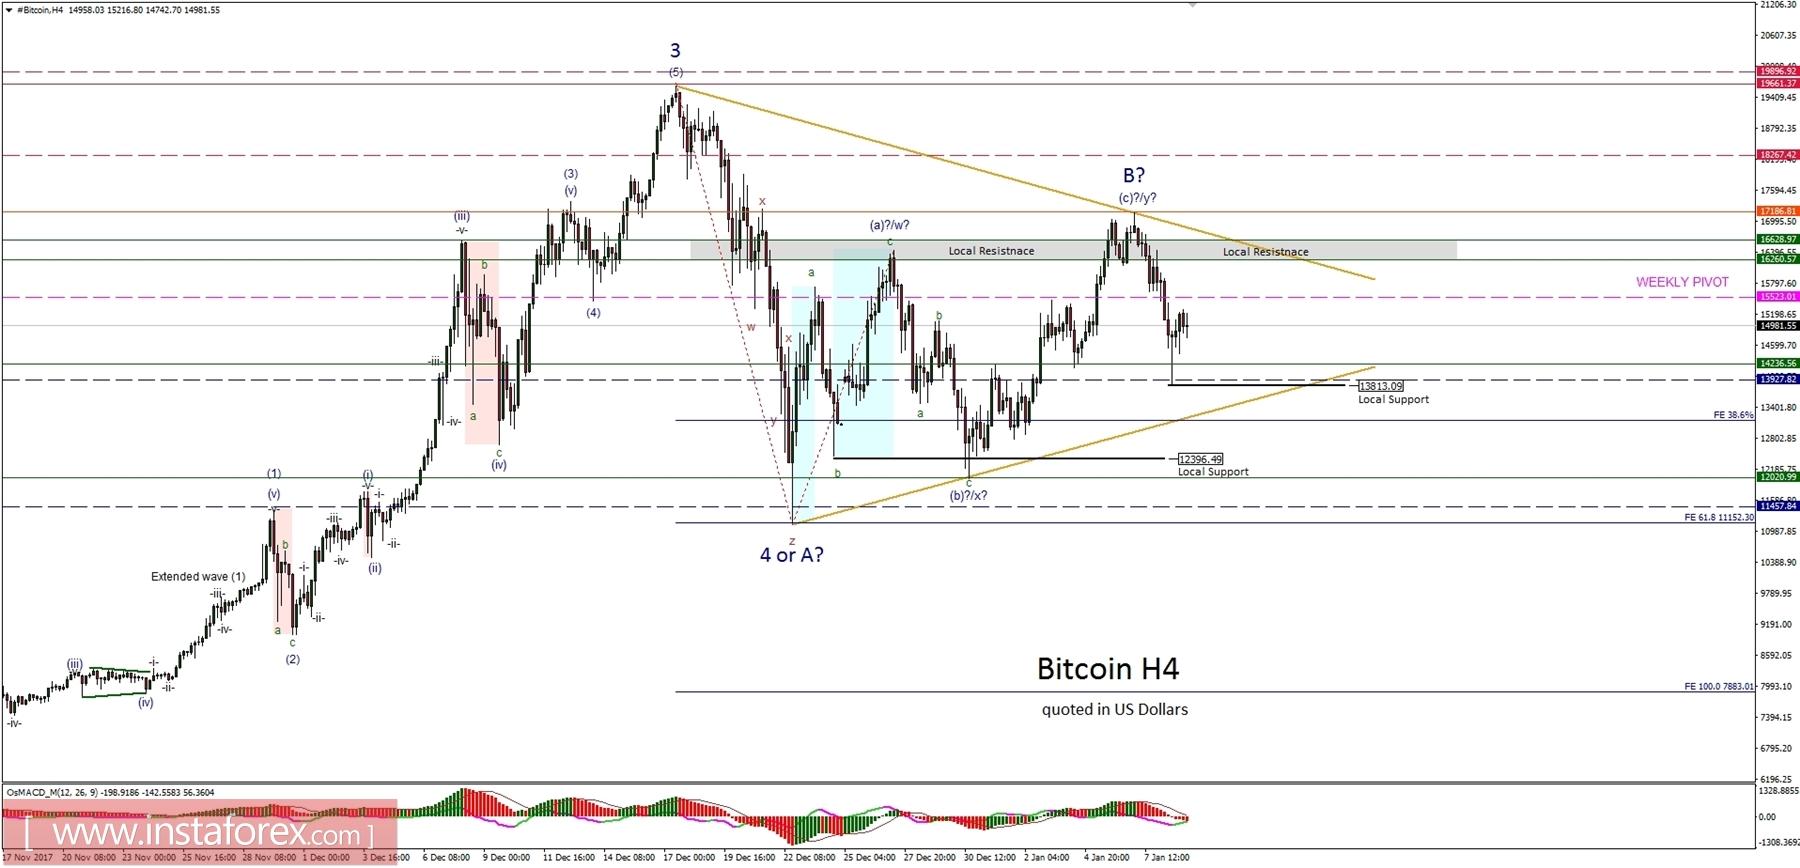 Bitcoin Analysis for 09.01.2018